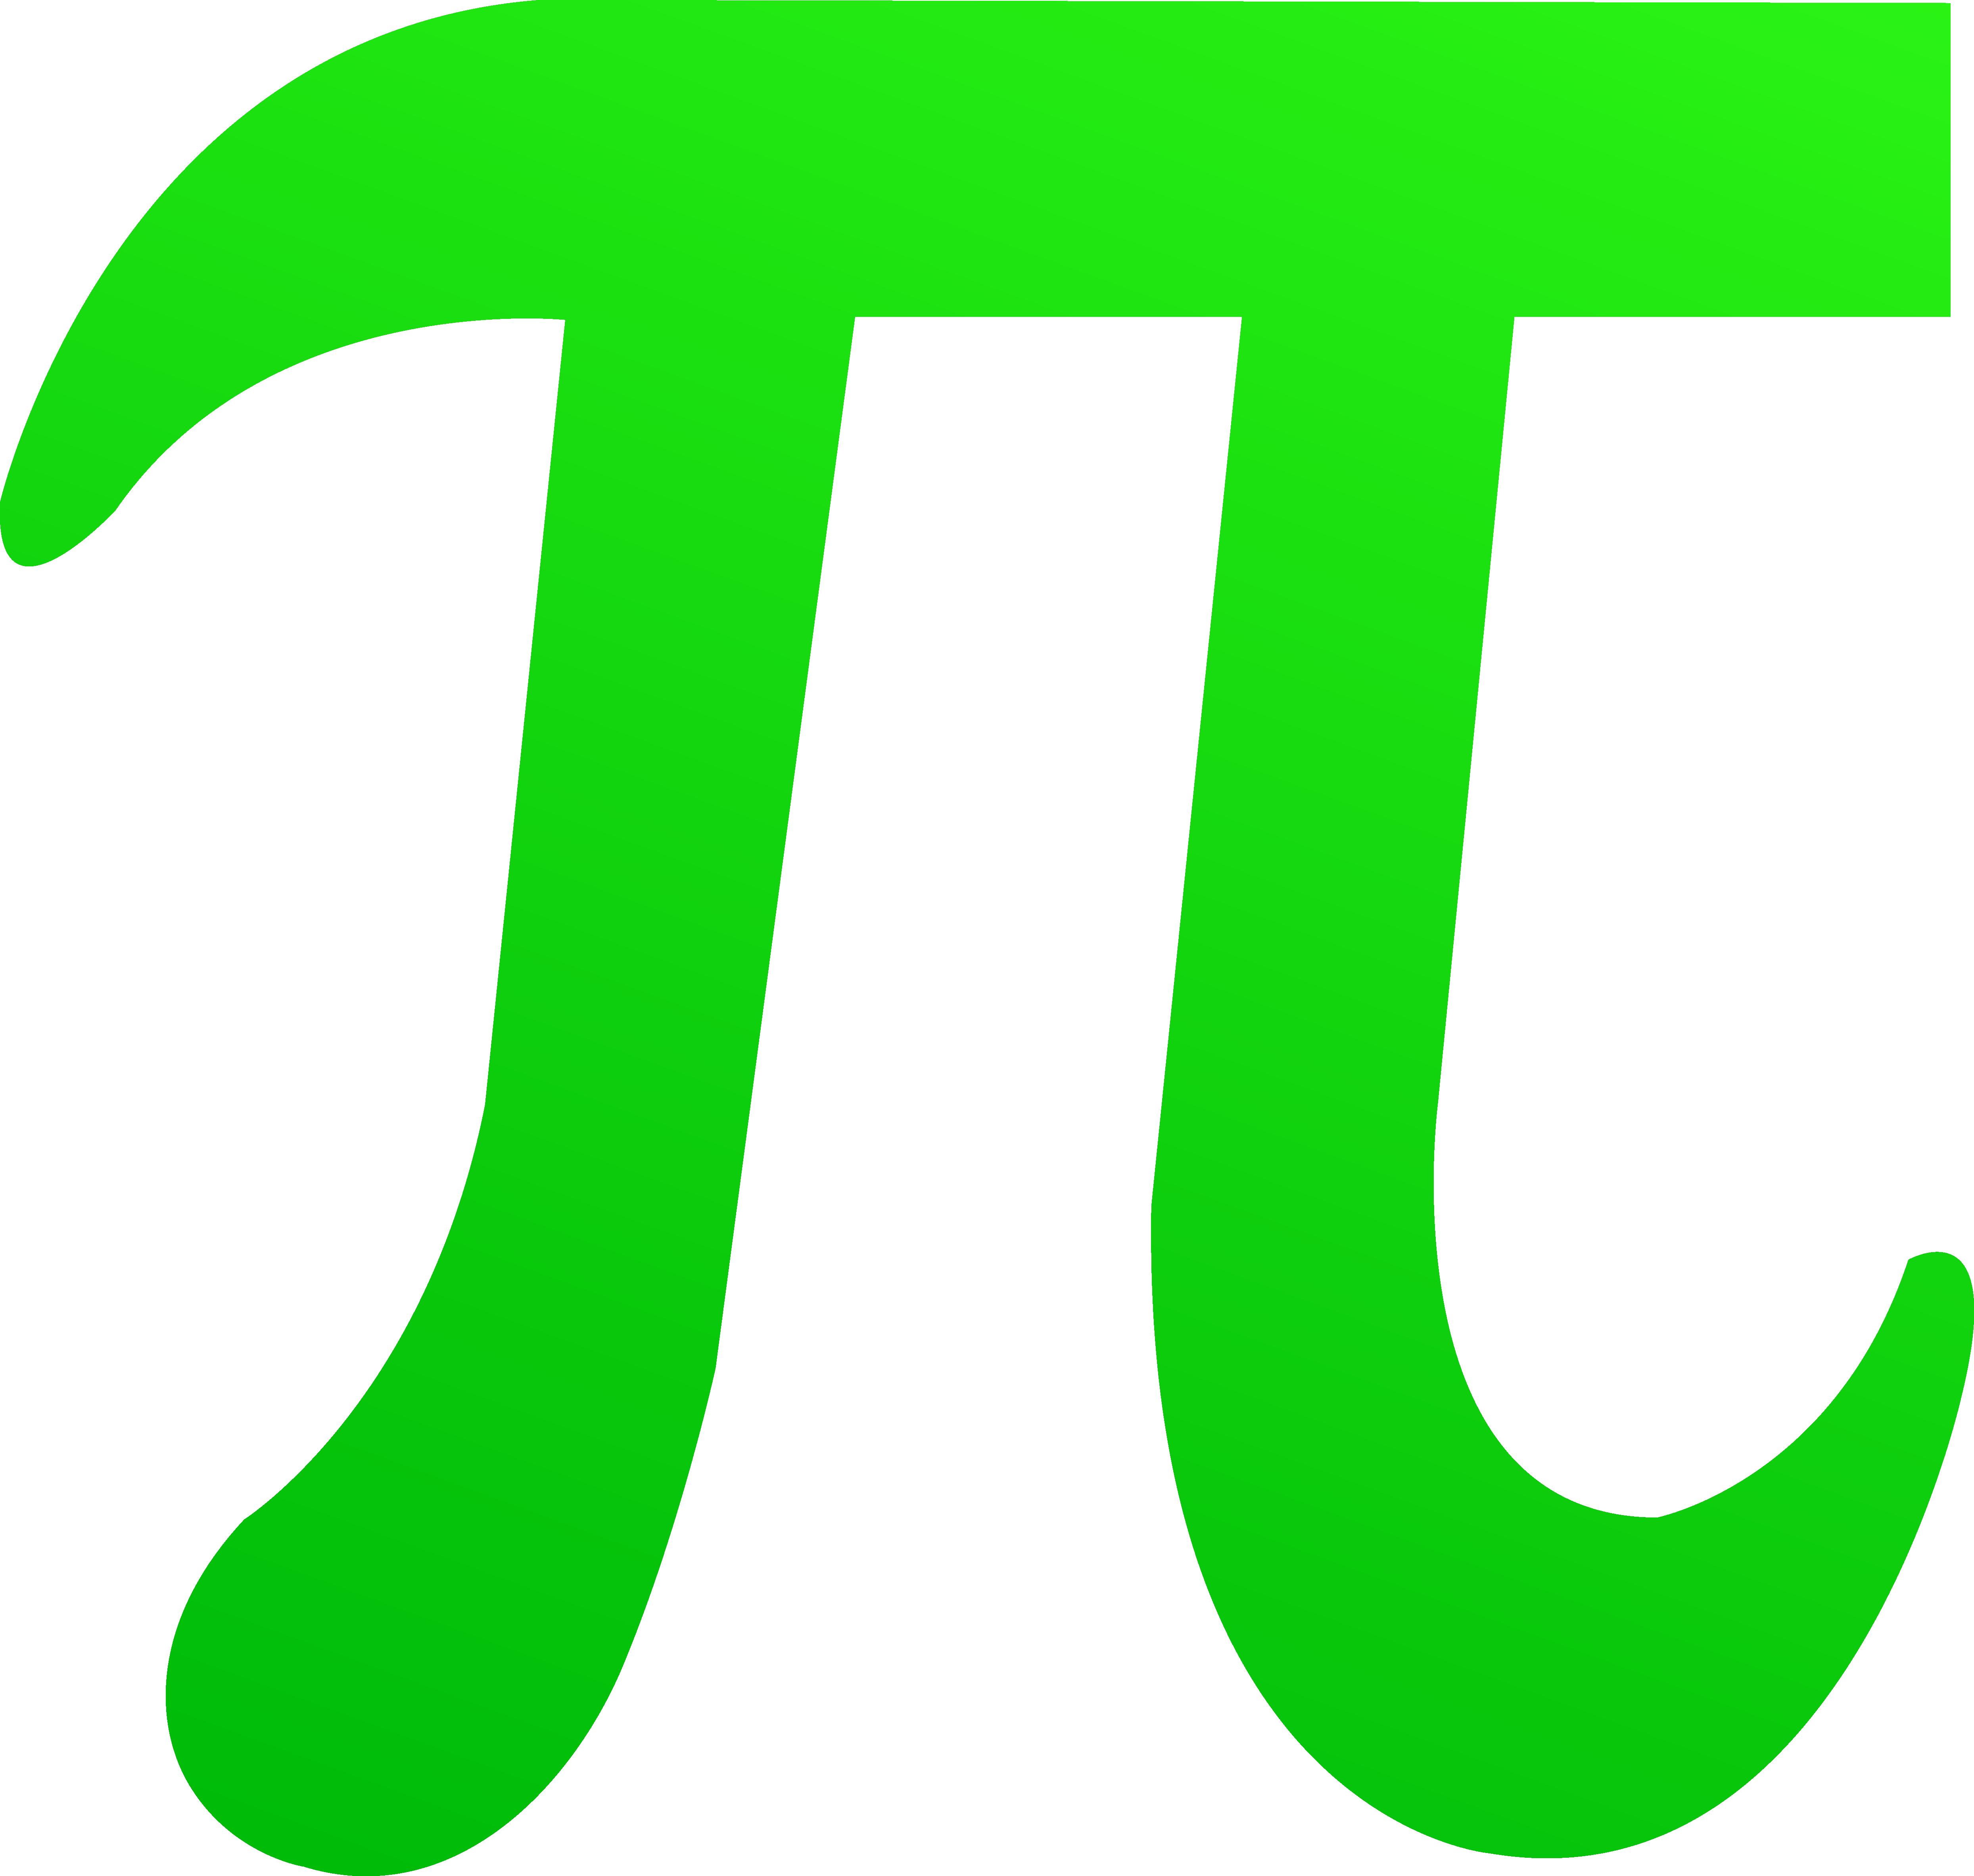 Number clipart 1 jpg transparent Green Pi Symbol - Free Clip Art jpg transparent